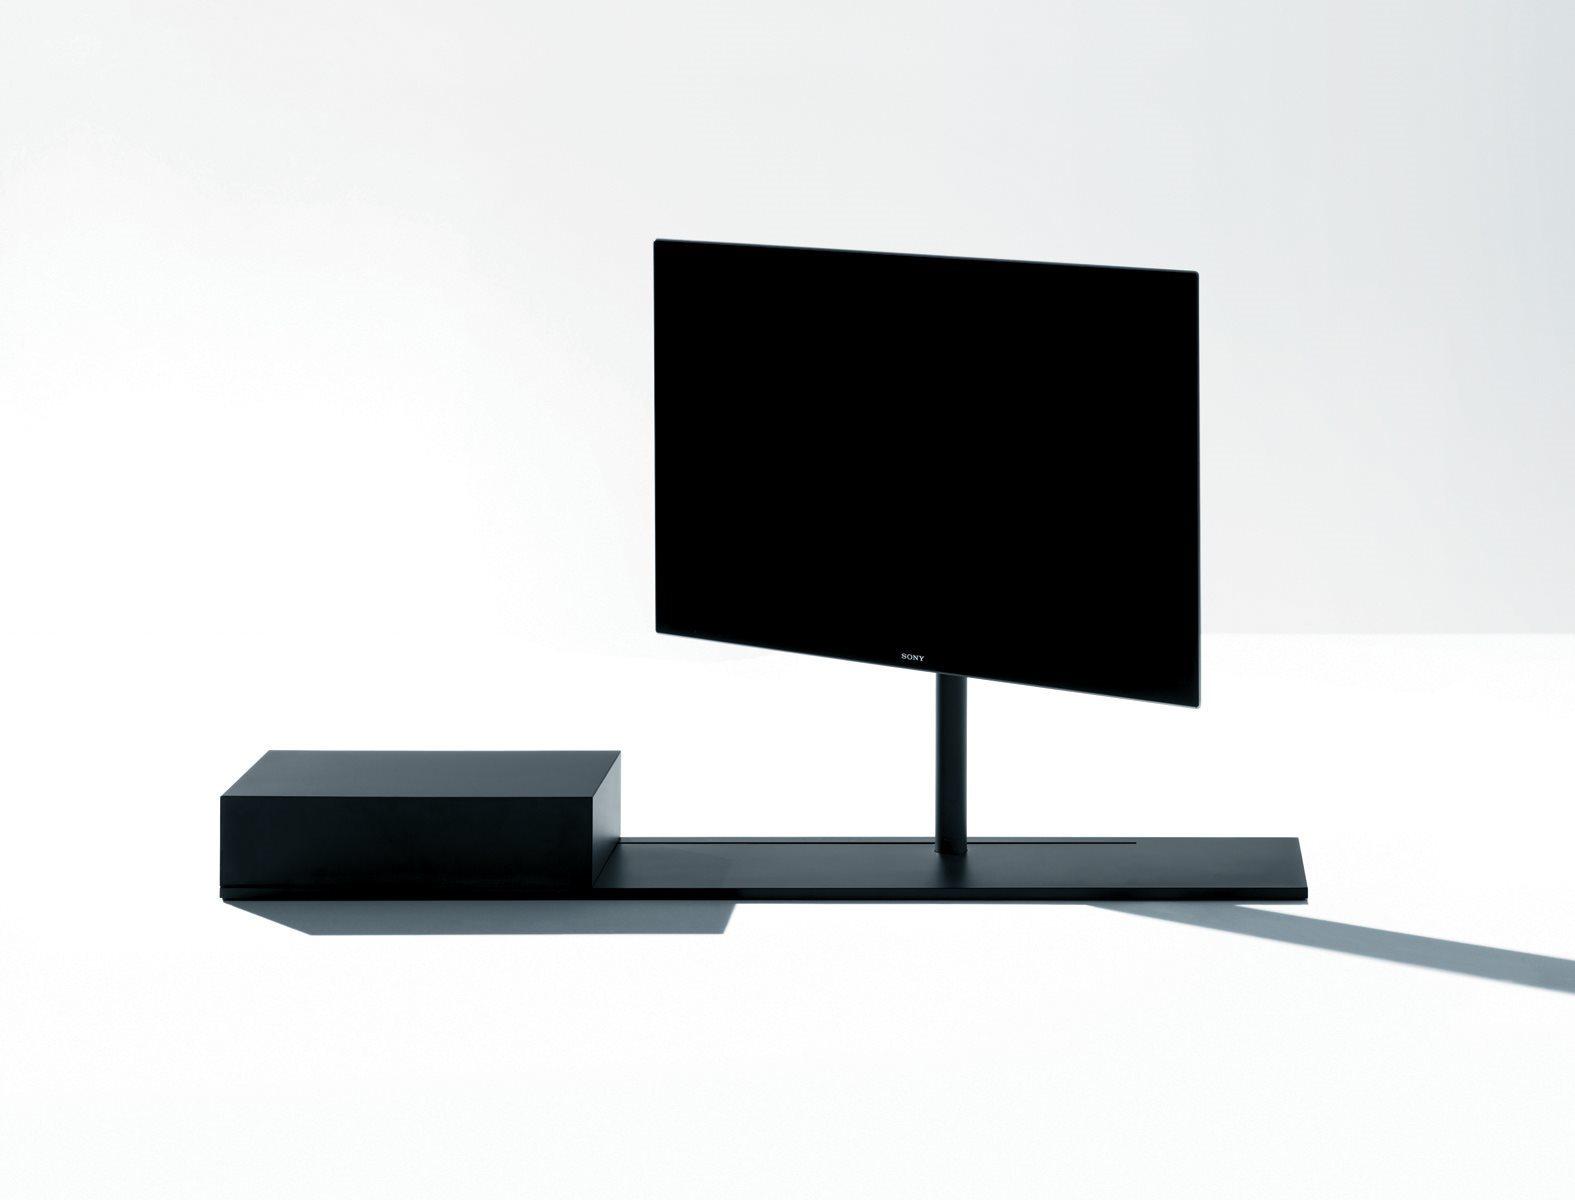 Sail 302 TV Stand System B06, H 94cm, No Shelf, W 190cm, Right TV Positioning, B59 Matt Black